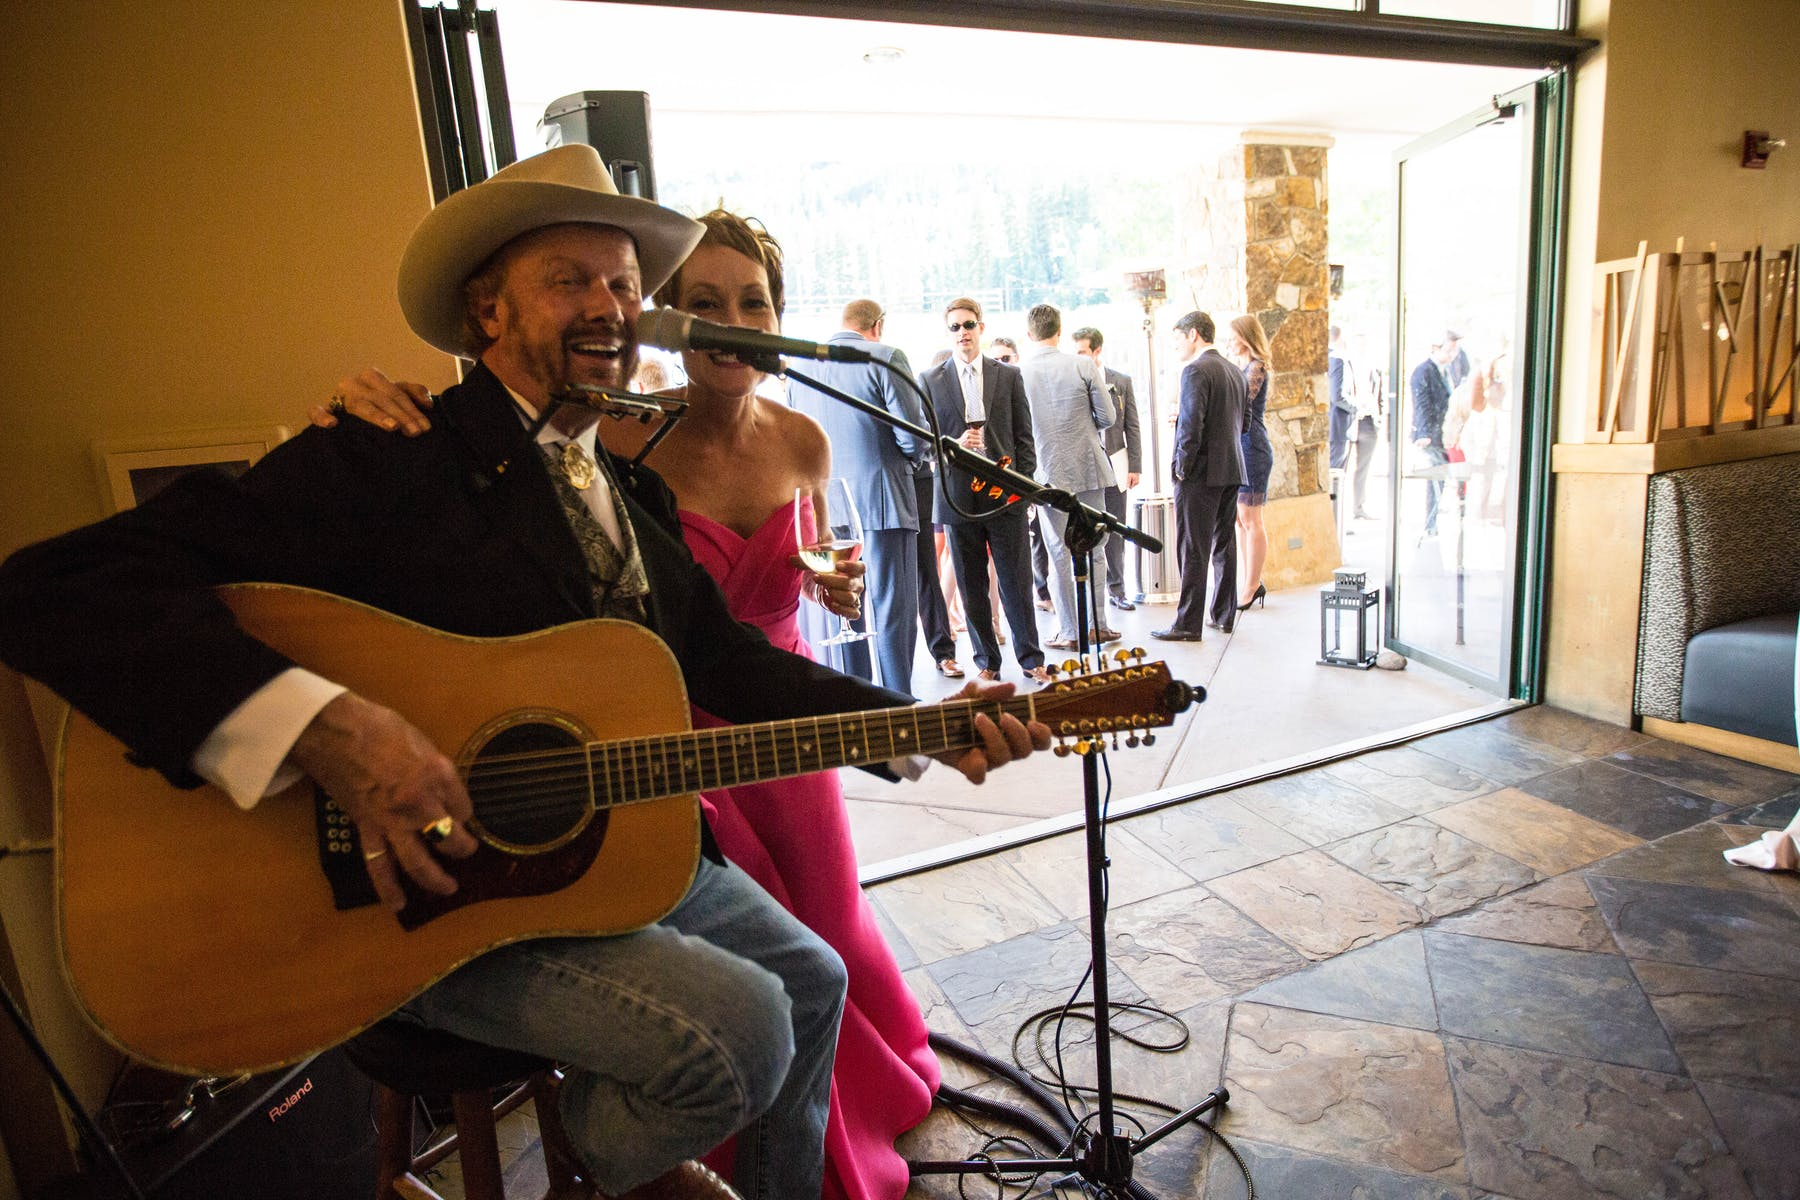 Larkspur Wedding Venue Vail Colorado Mountain Patio Outdoors Musicians